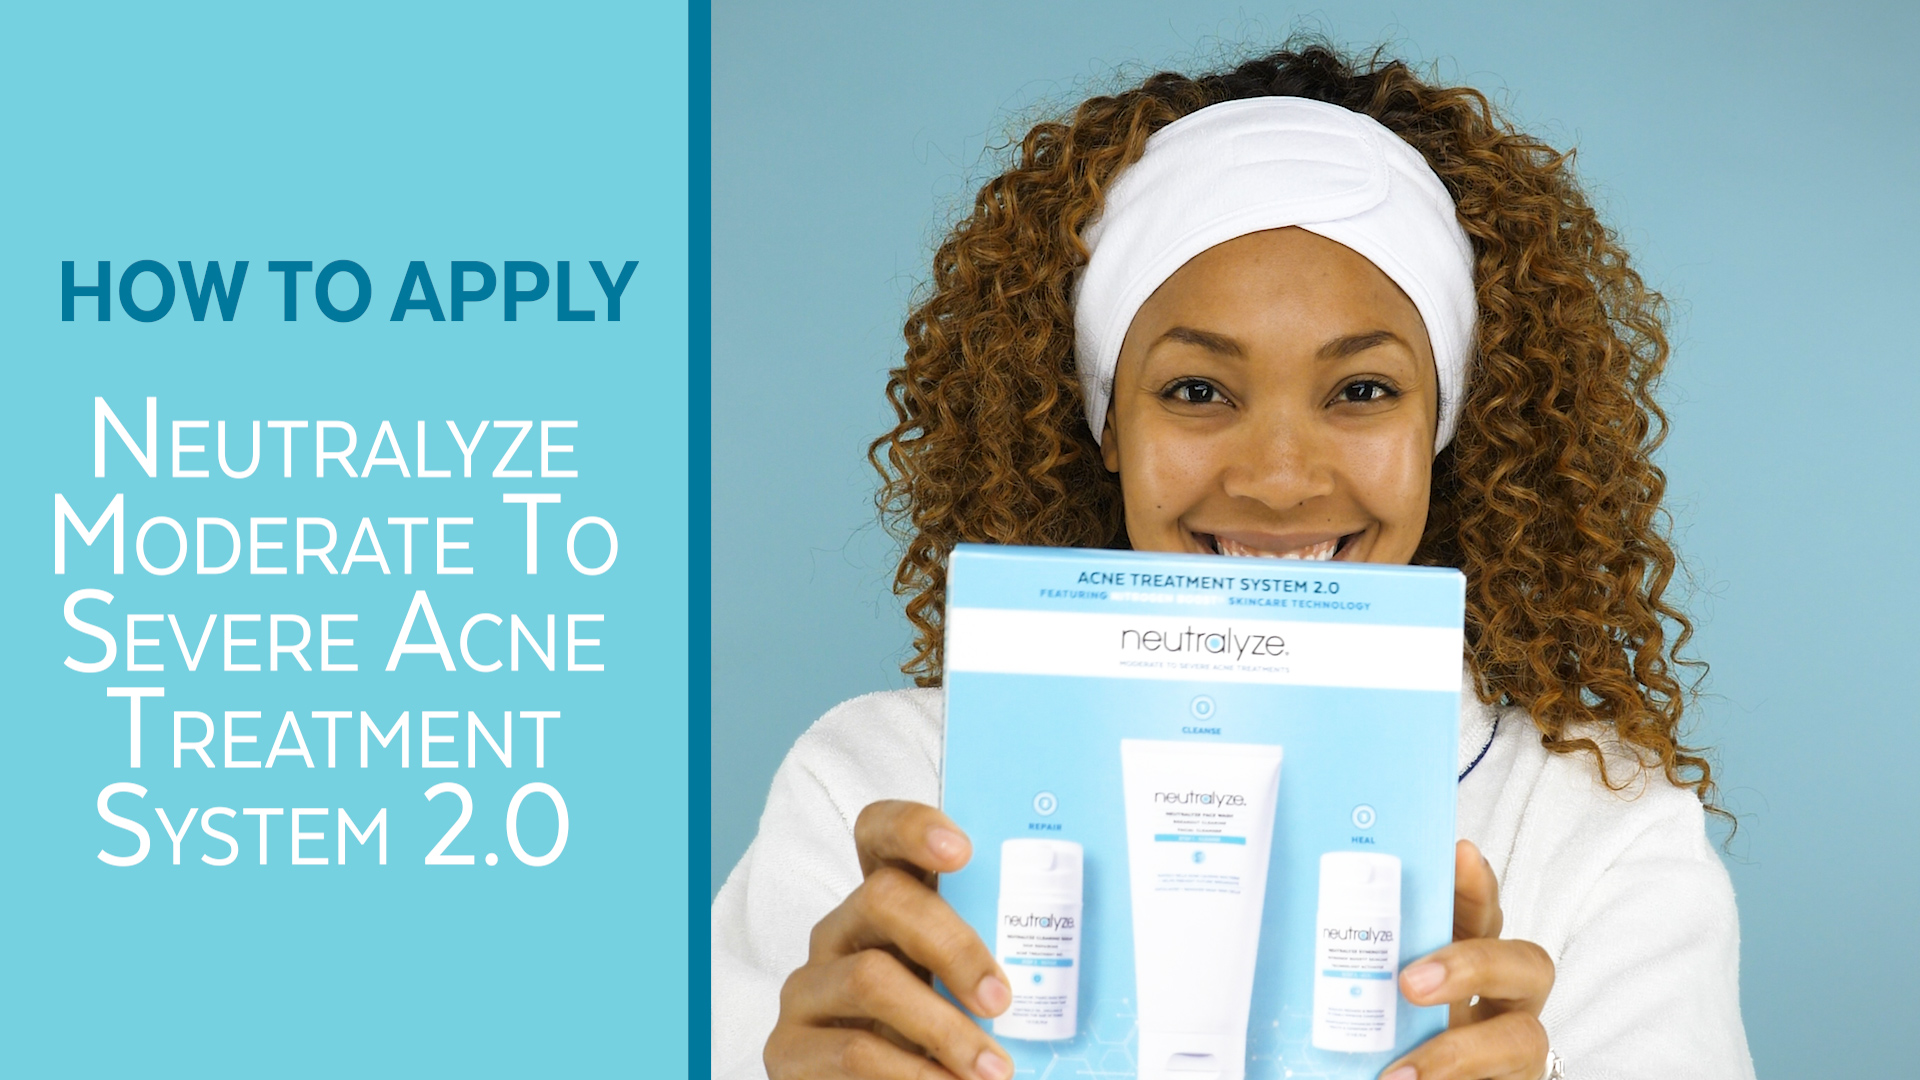 Neutralyze Acne Face Wash | Maximum Strength Facial Cleanser For Acne Prone Skin With 2% Salicylic Acid + 1% Mandelic… 6